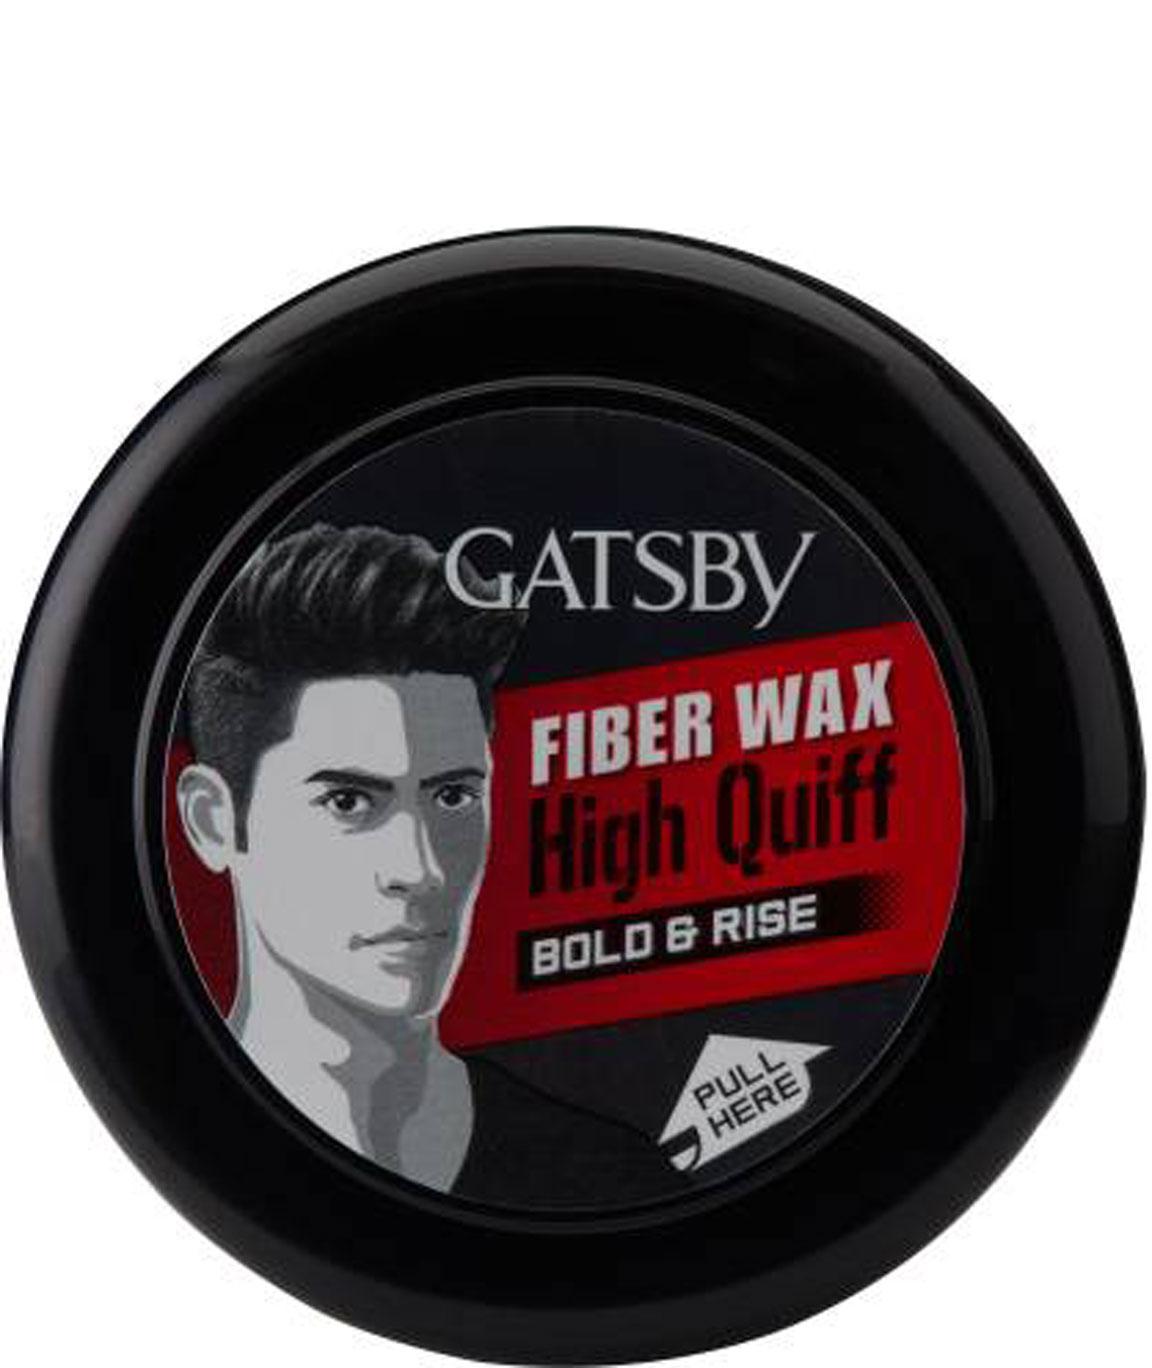 GATSBY HAIR STYLING FIBER WAX BOLD & RISE 75 Gm HAIR WAX (75 Gm)